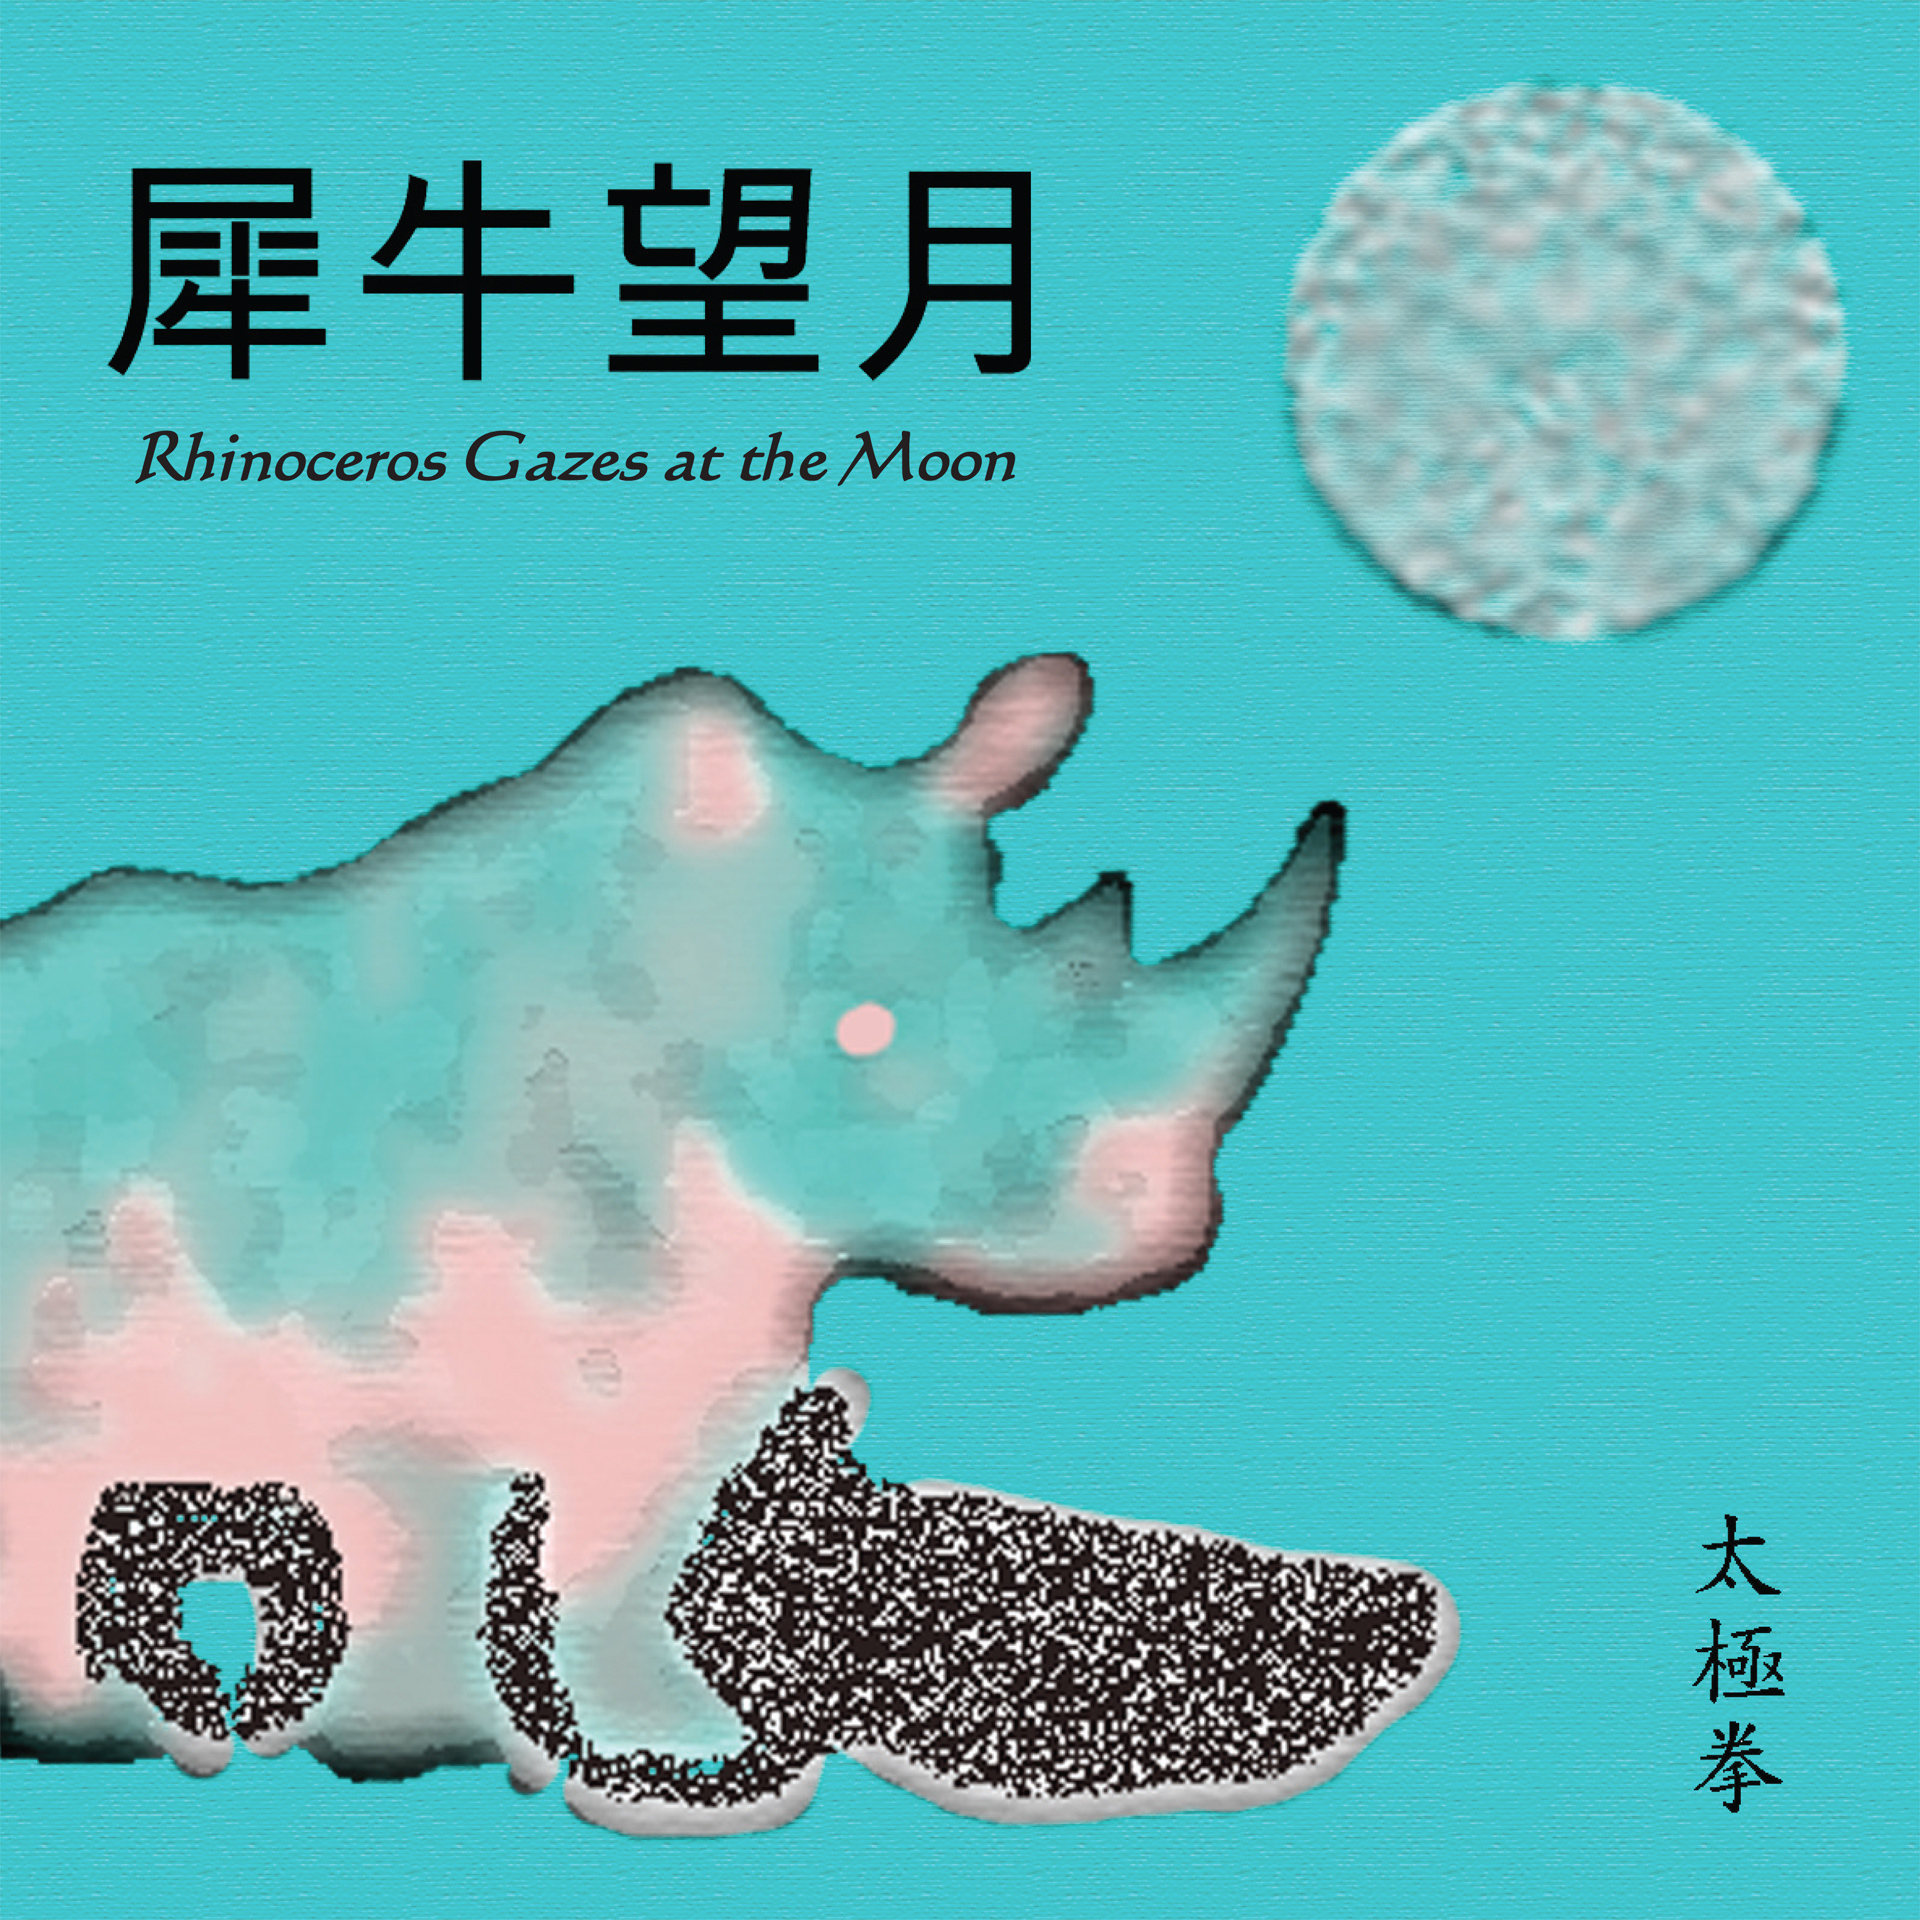 Rhinoceros Gazes at the Moon